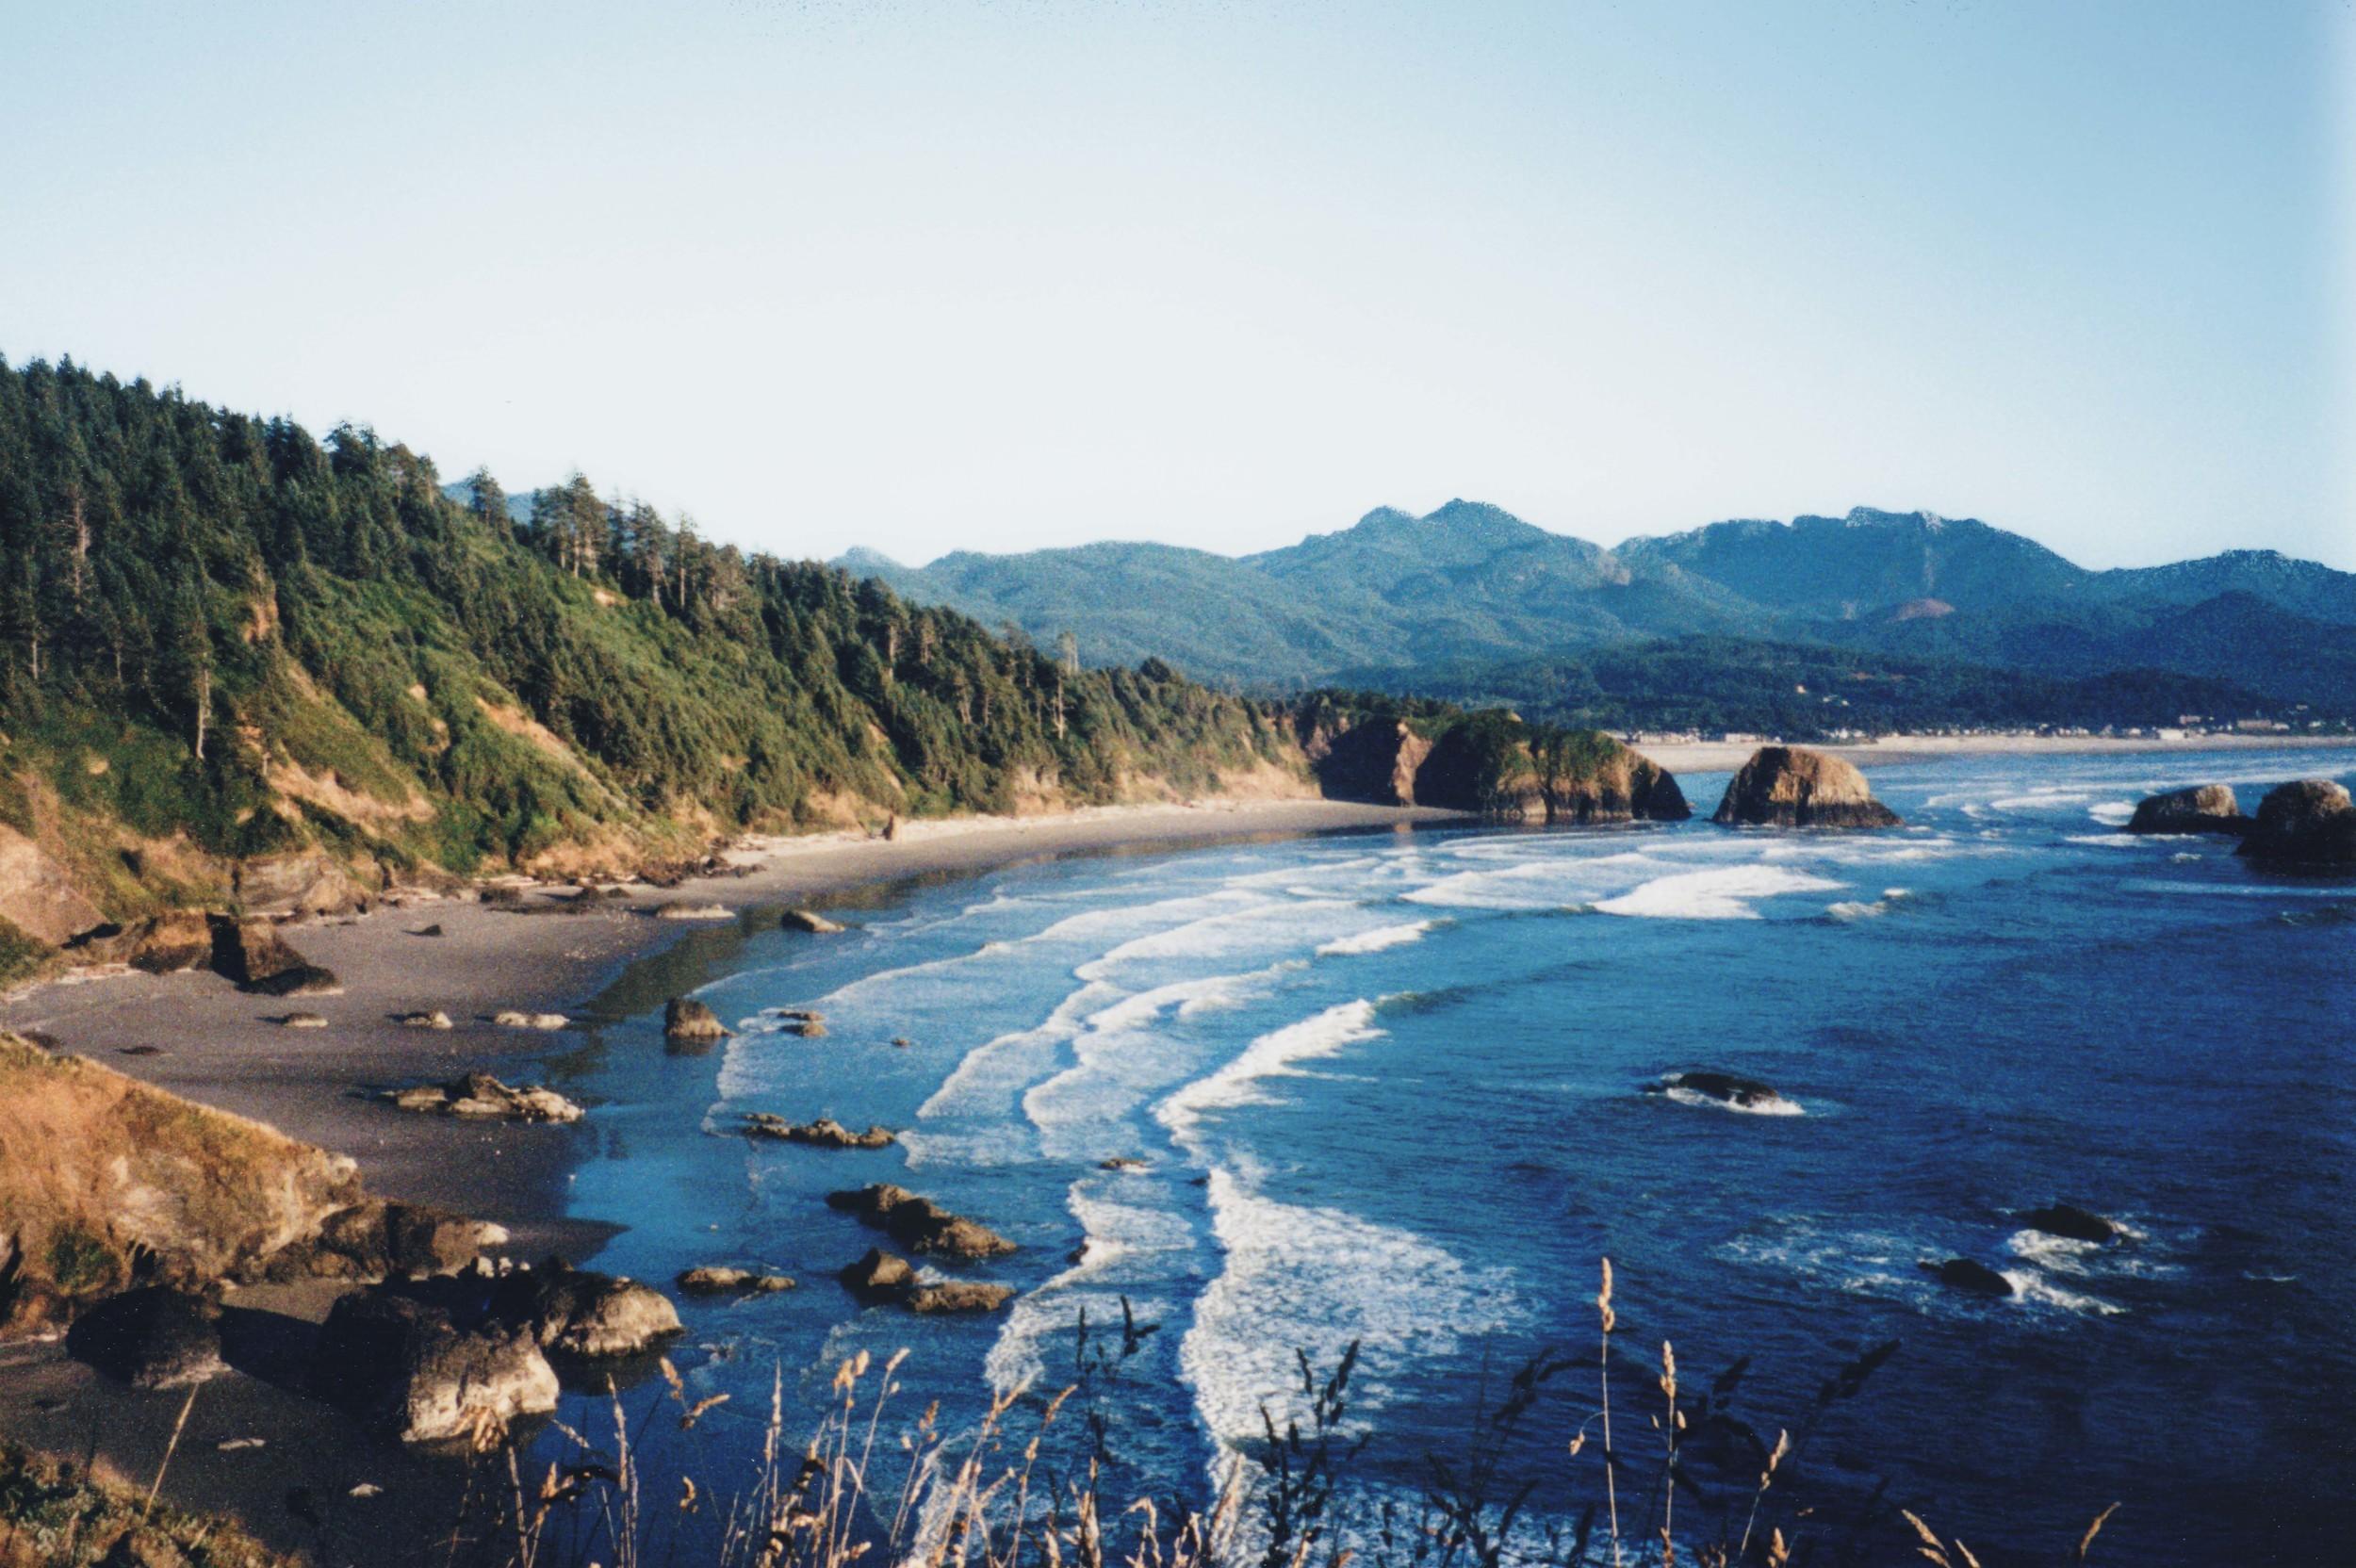 Oregon Coast - Circa 1989 Scanned from 35mm film print